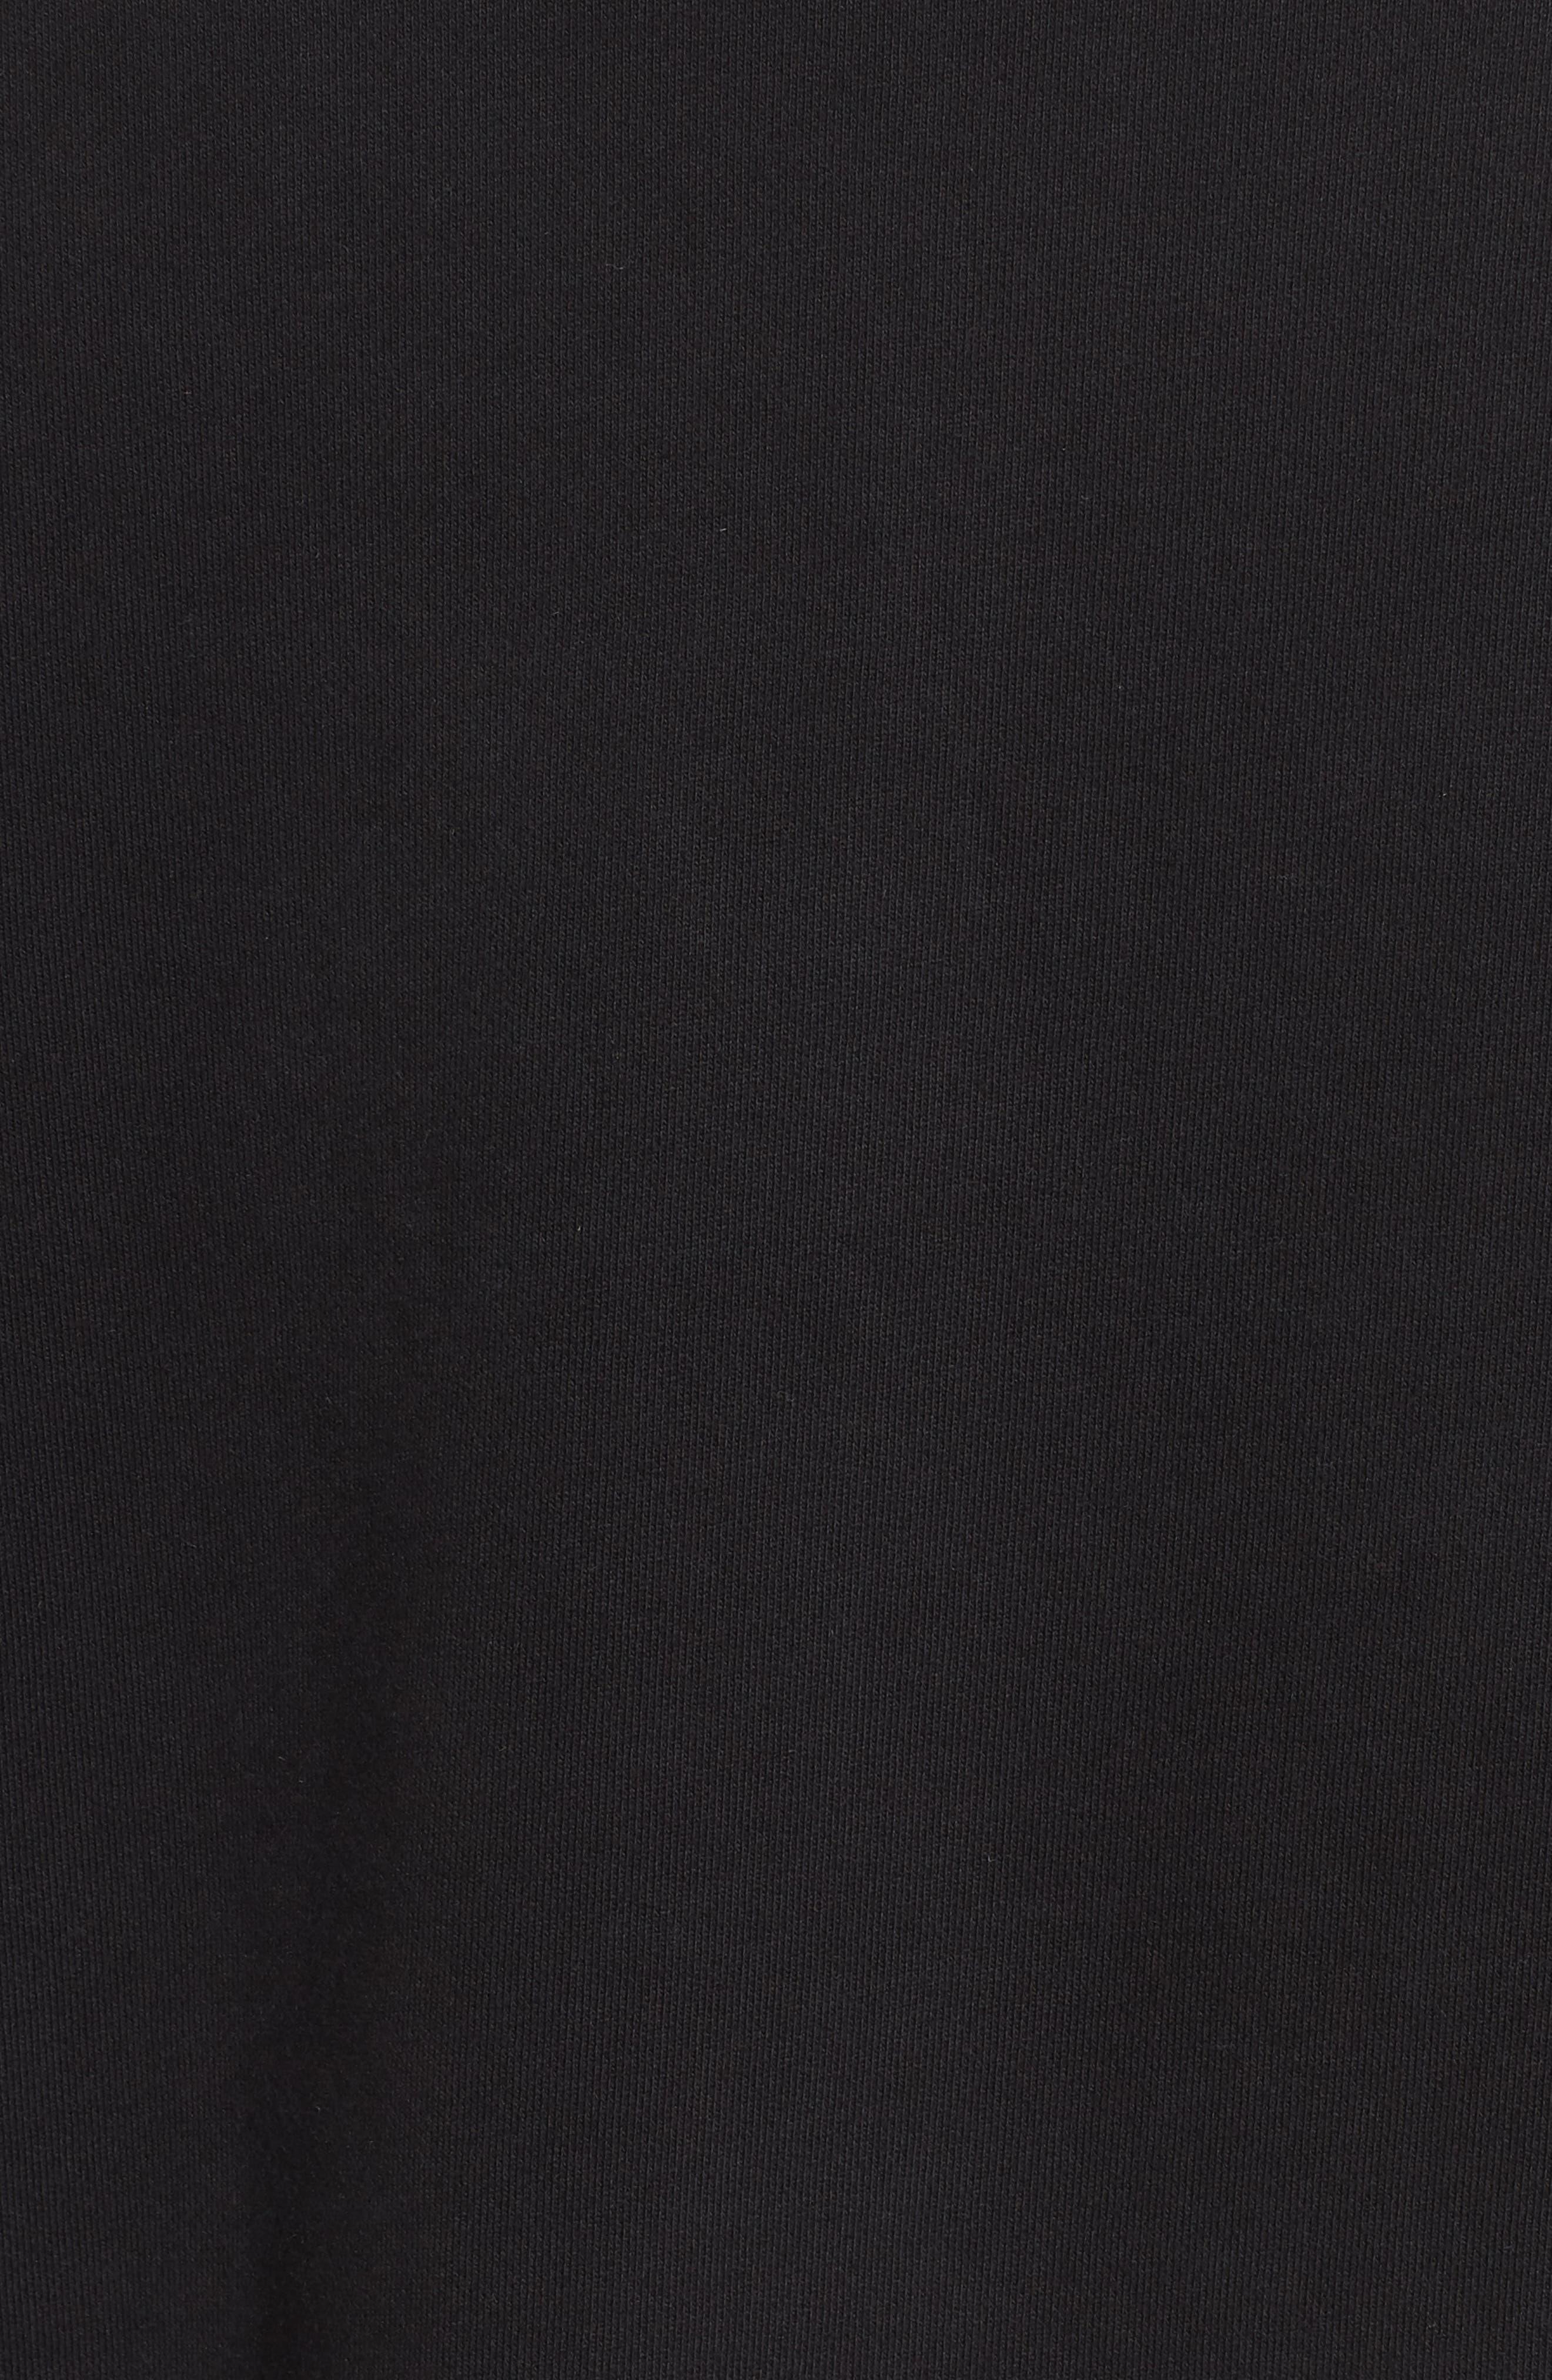 Collegiate Knit Inset Jacket,                             Alternate thumbnail 6, color,